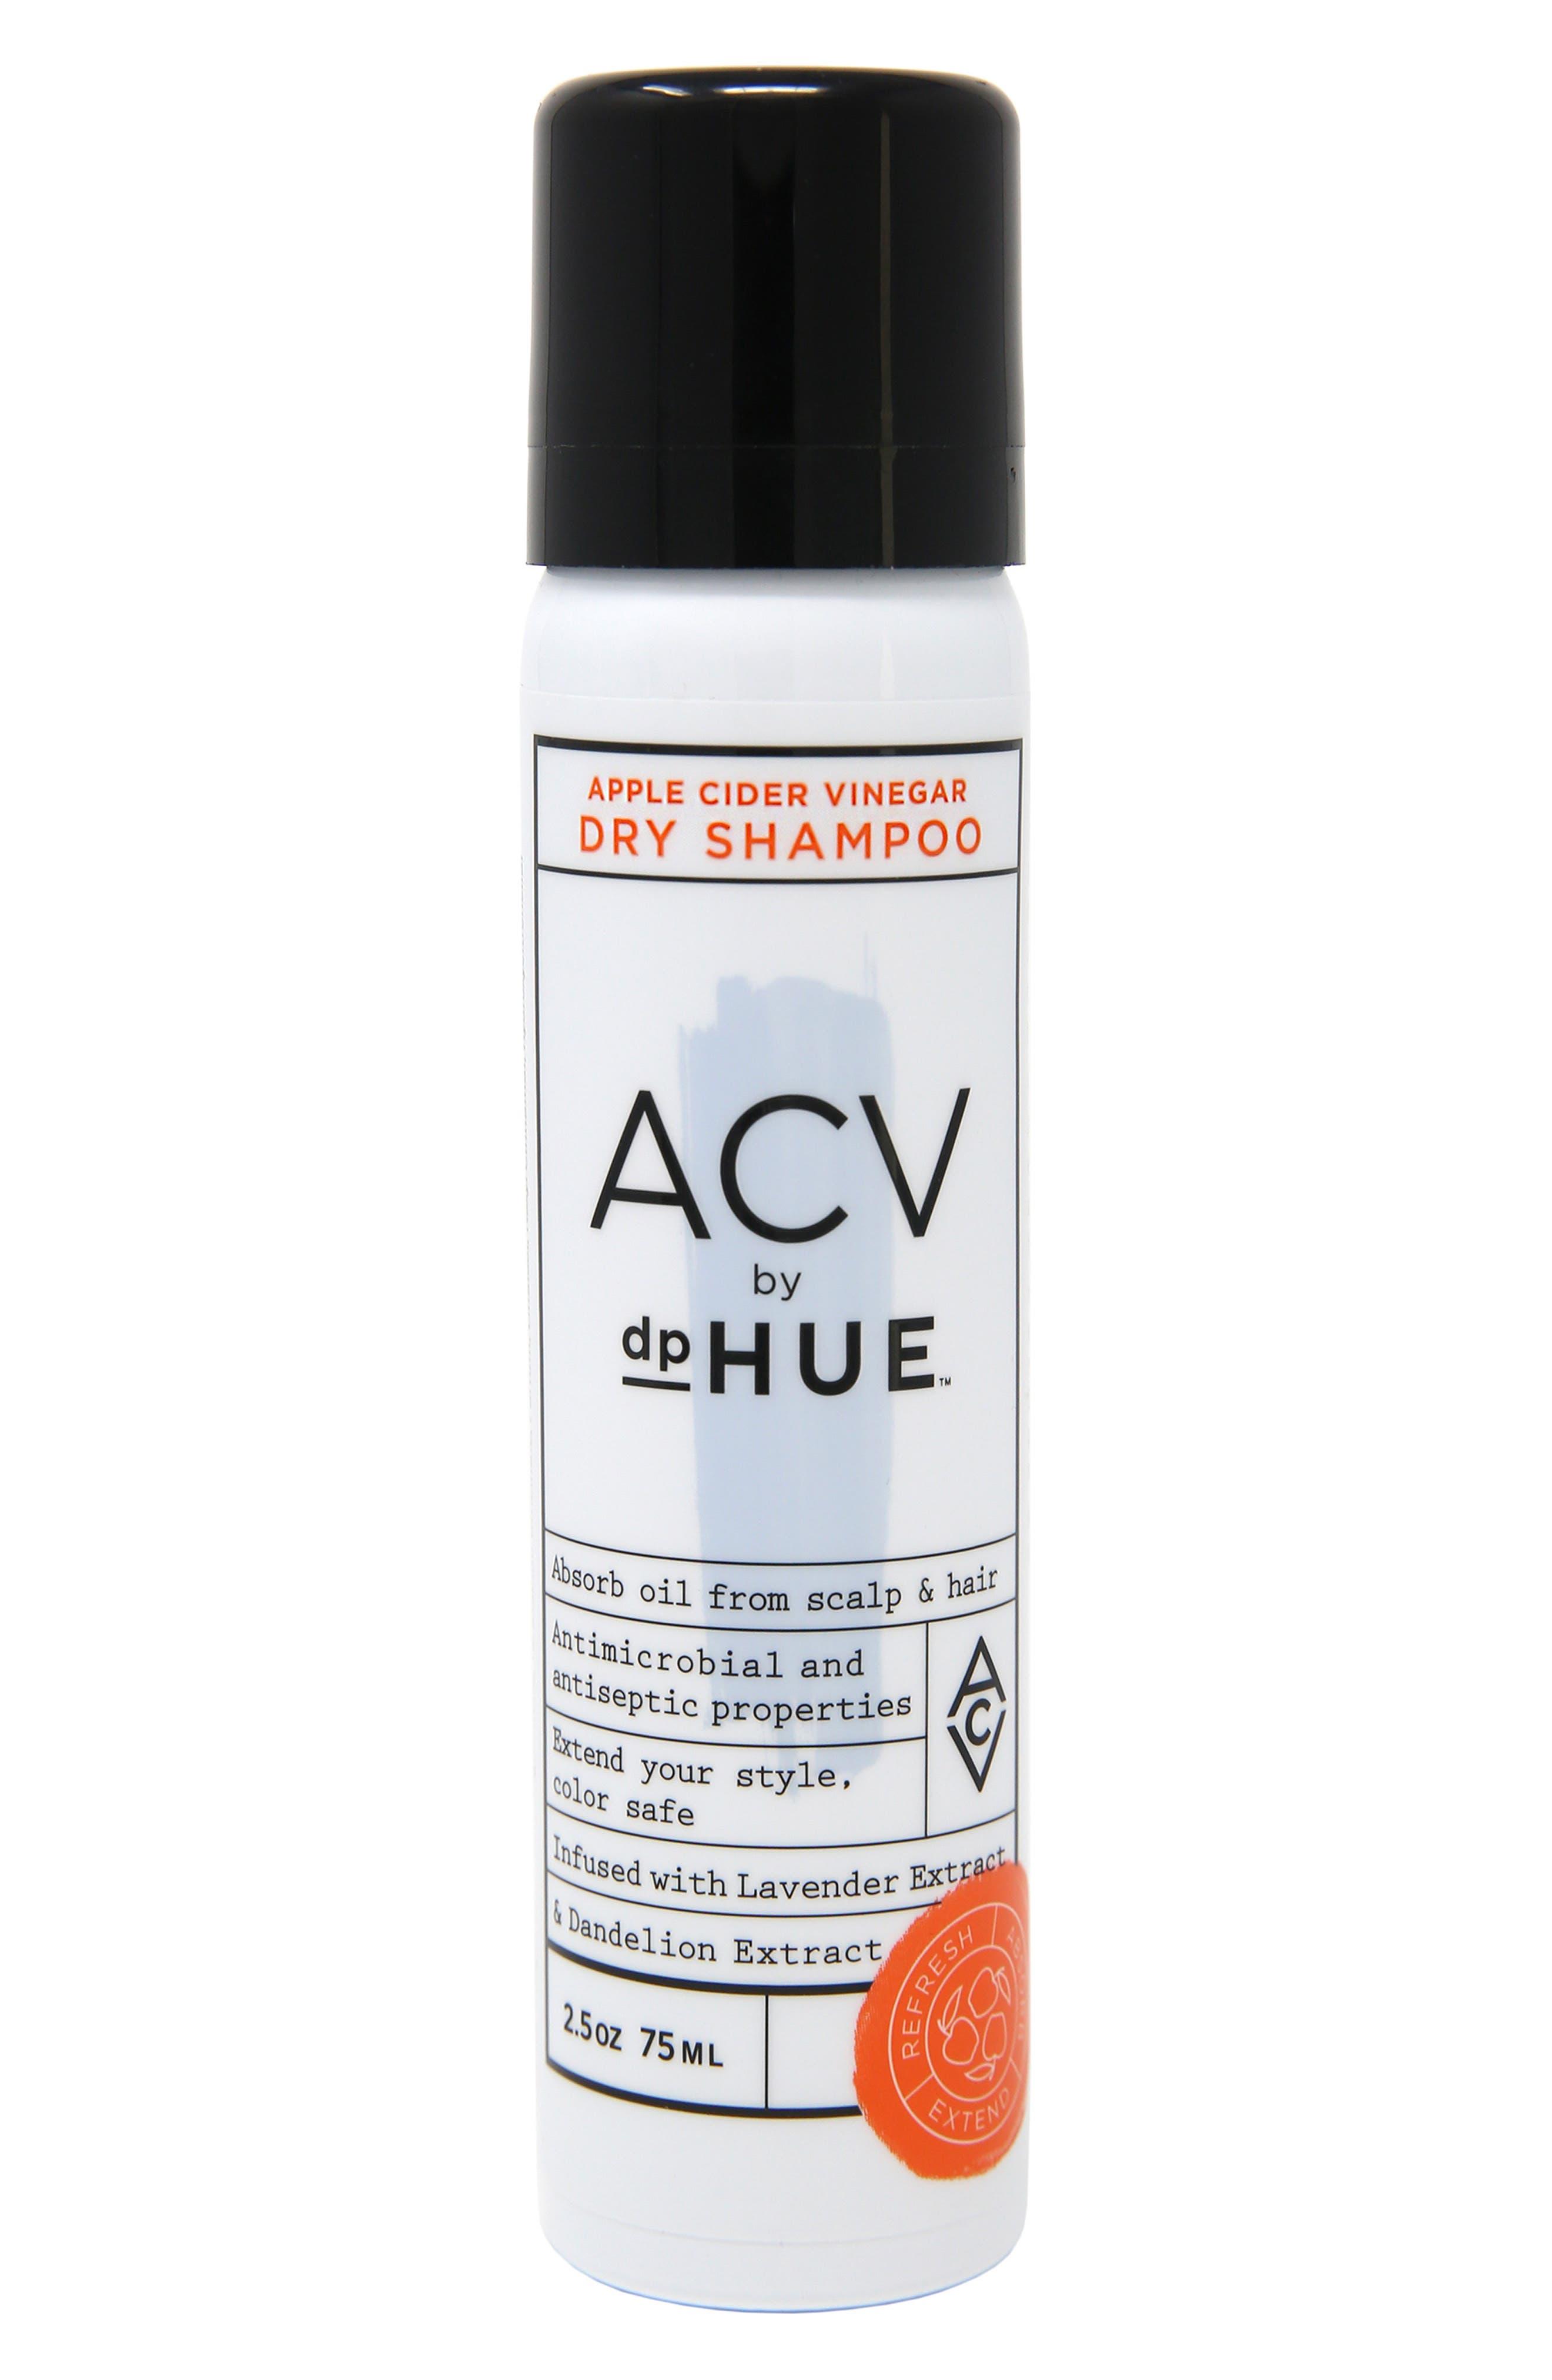 DPHUE Apple Cider Vinegar Dry Shampoo